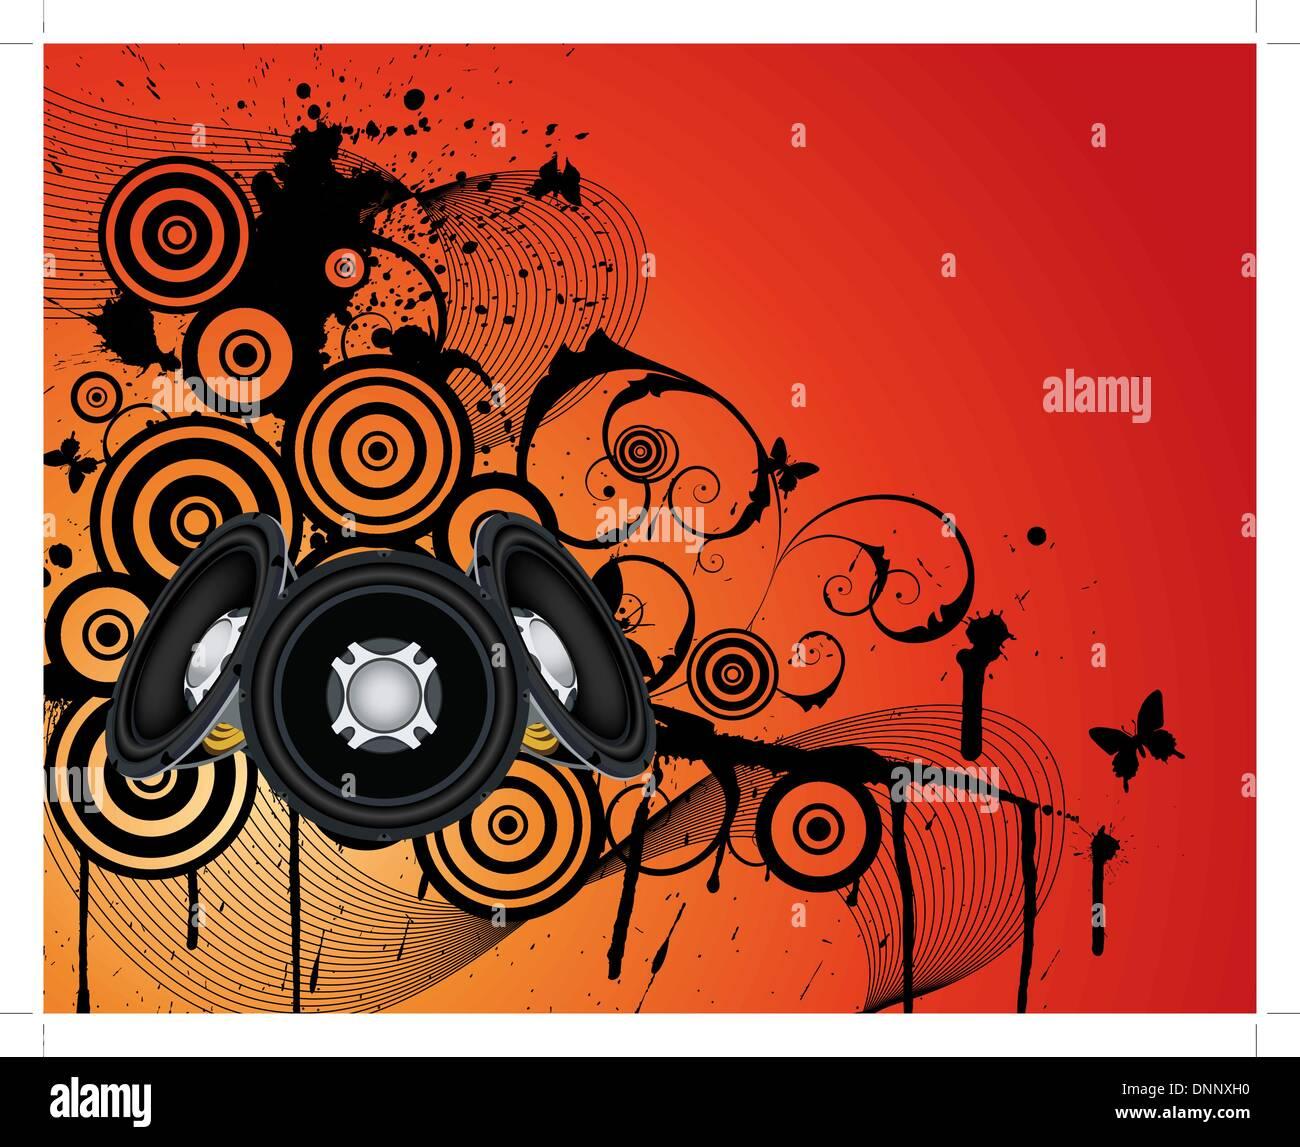 Grunge fond musical. EPS 10 vectorillustration sans transparence. Photo Stock